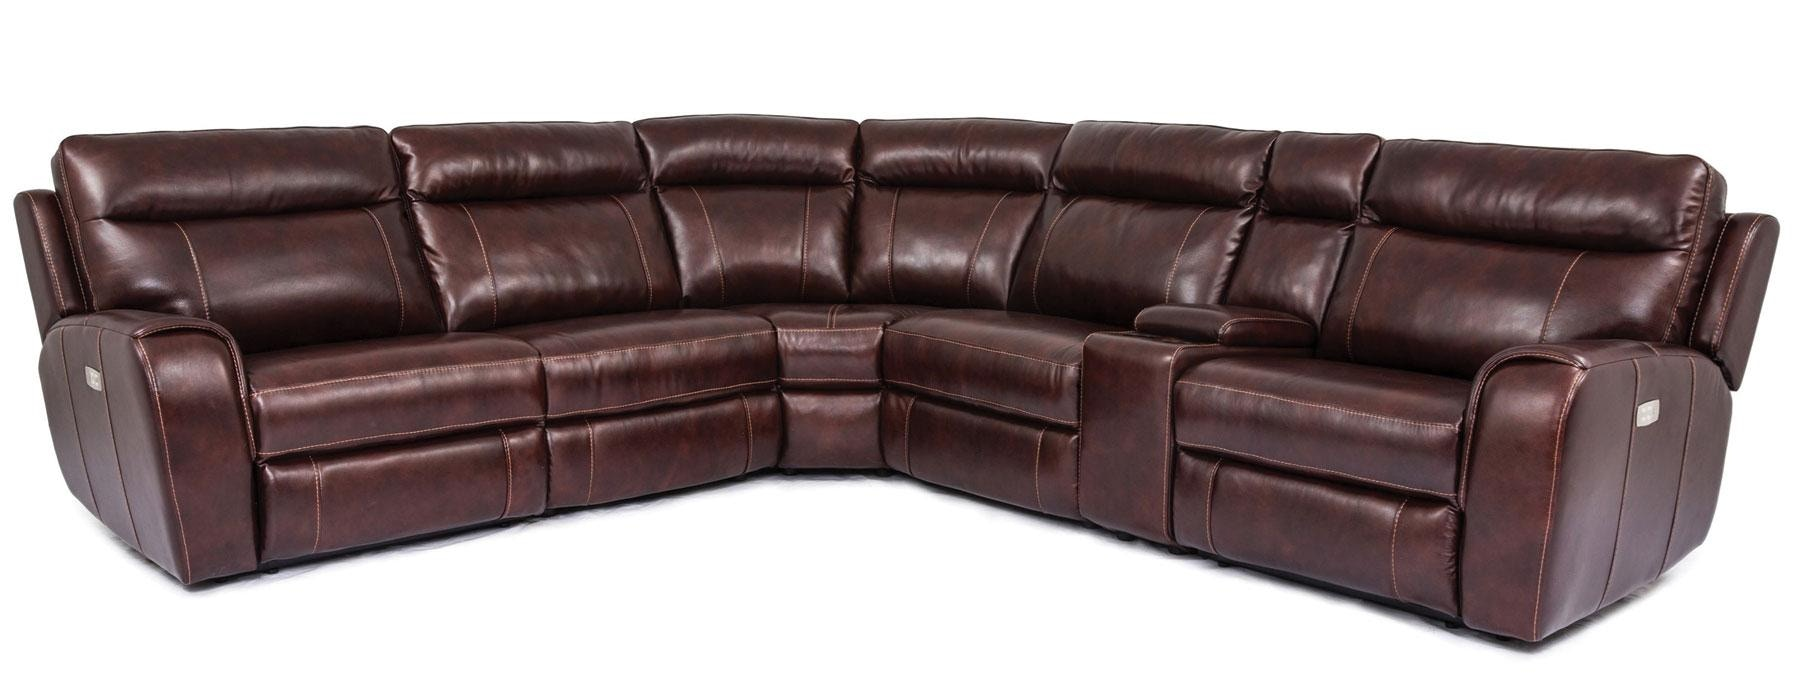 Bradley sectional sc 1 st lane furniture for Sectional sofa furniture fair